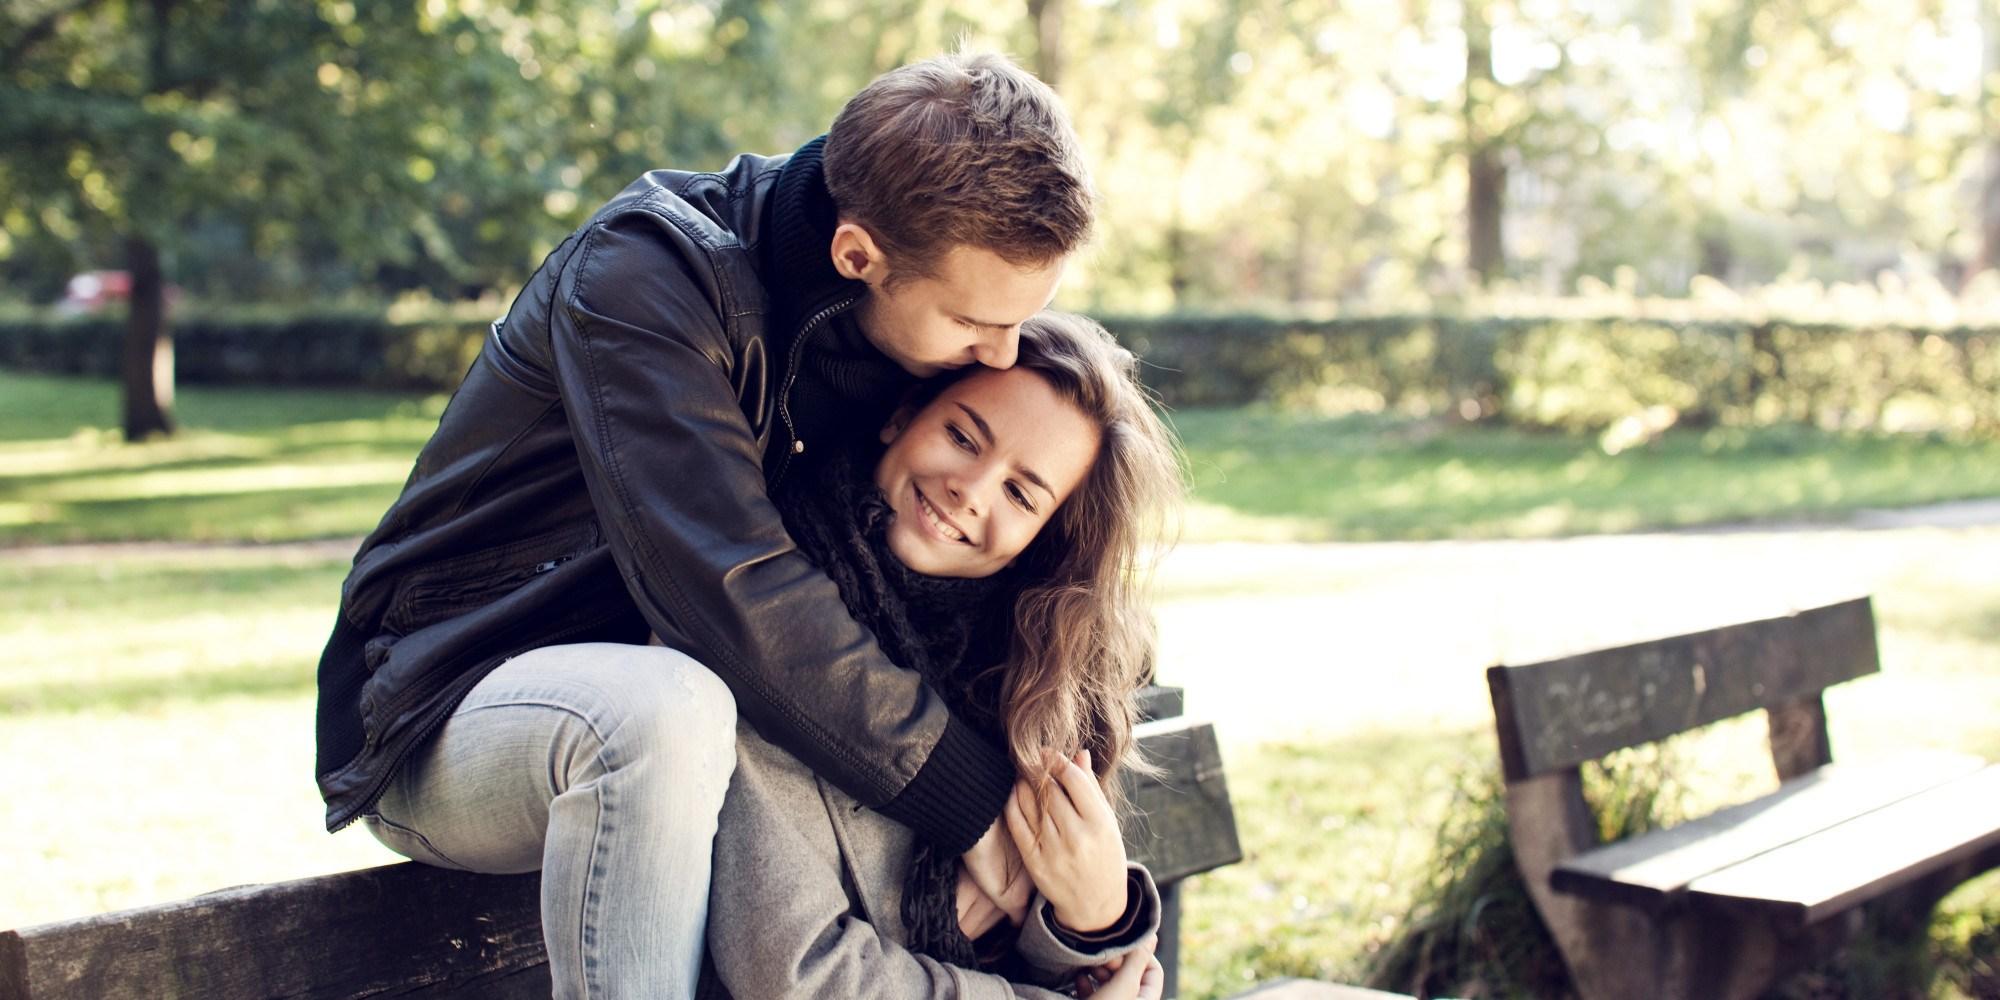 setia couple cuddling love